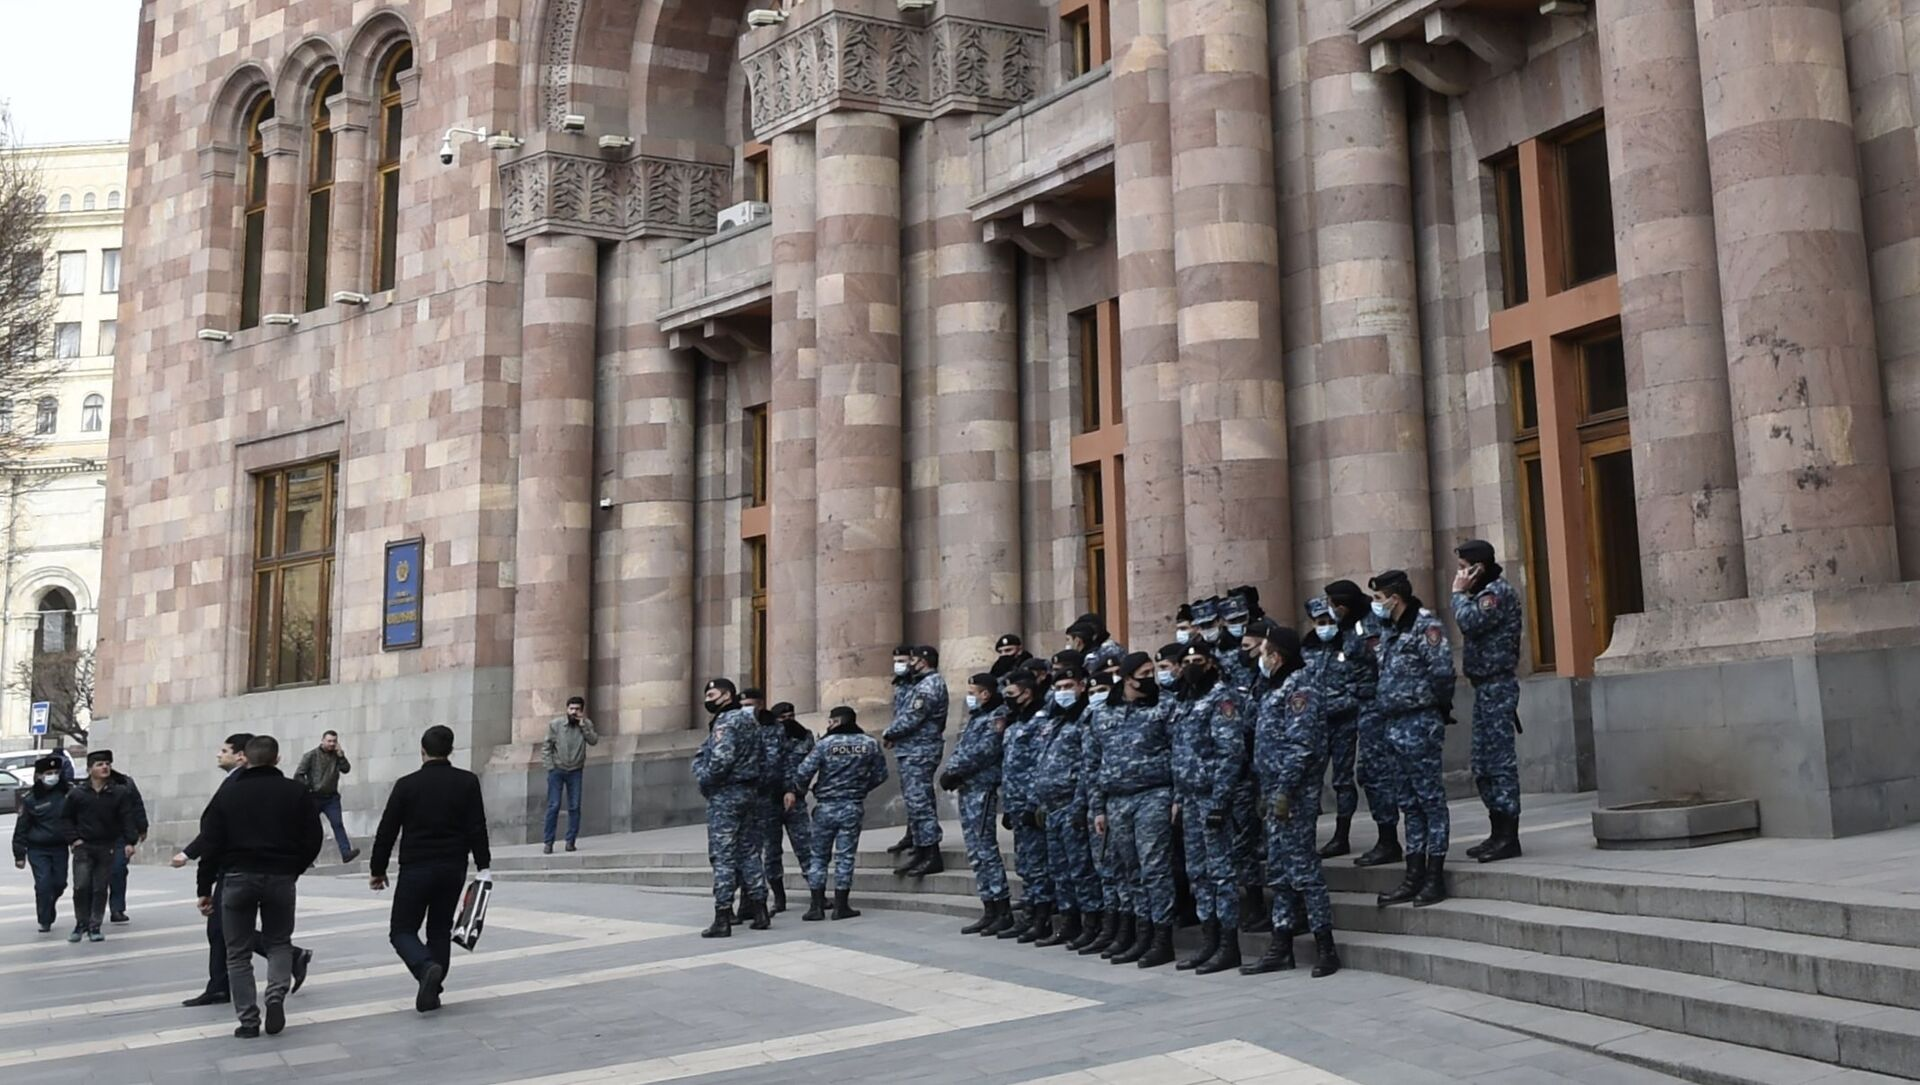 Proteste a Yerevan - Sputnik Italia, 1920, 25.02.2021